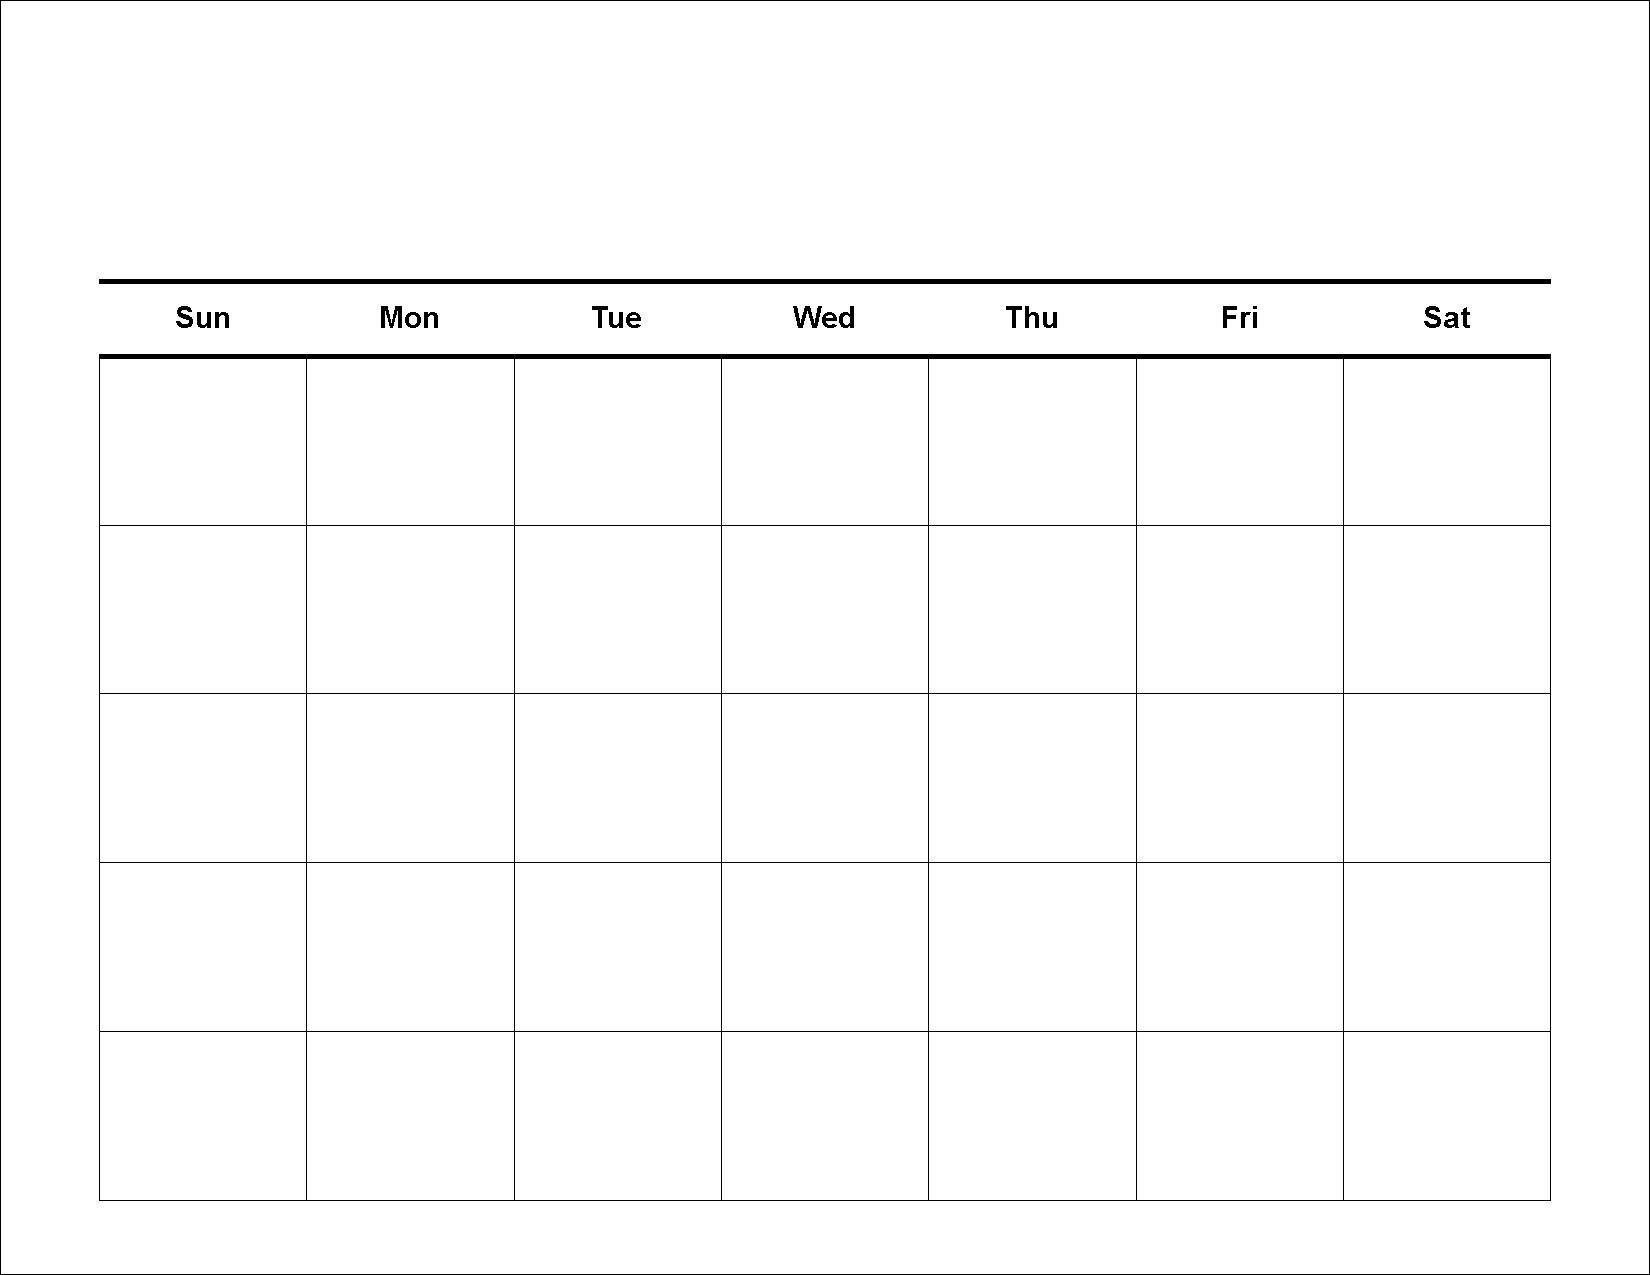 Printable Calendar Grid Leonescapersco Free 2 Week Blank Printable with regard to Free 2 Week Blank Printable Calendar